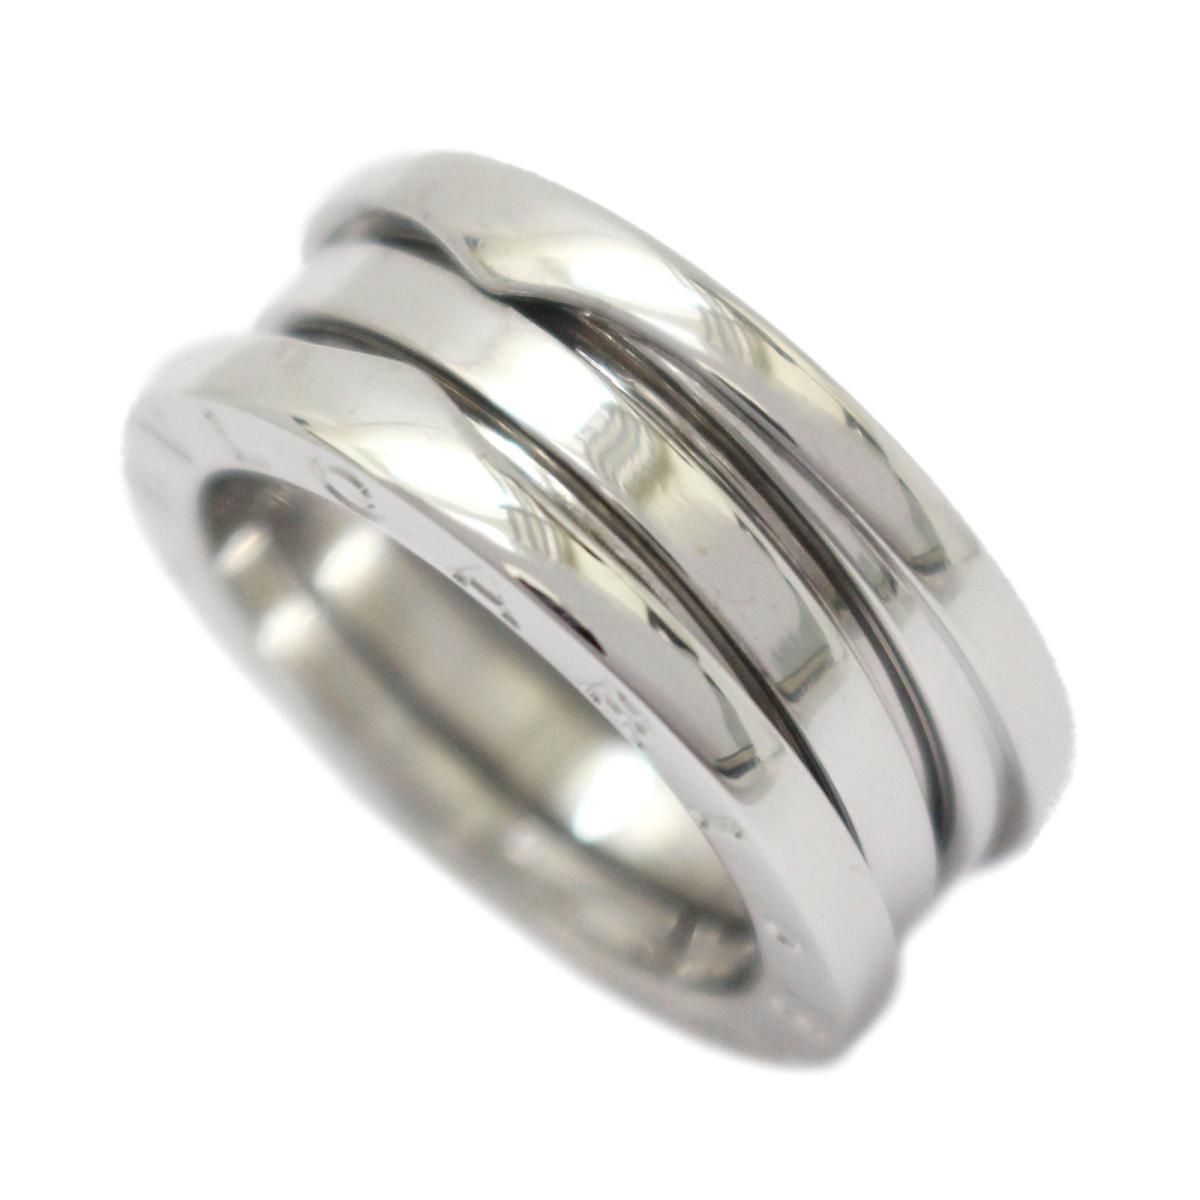 f5643eeb8325 ブルガリ CHANEL B-zero1 ダミエ リング SALE Sサイズ 指輪 メンズ ...